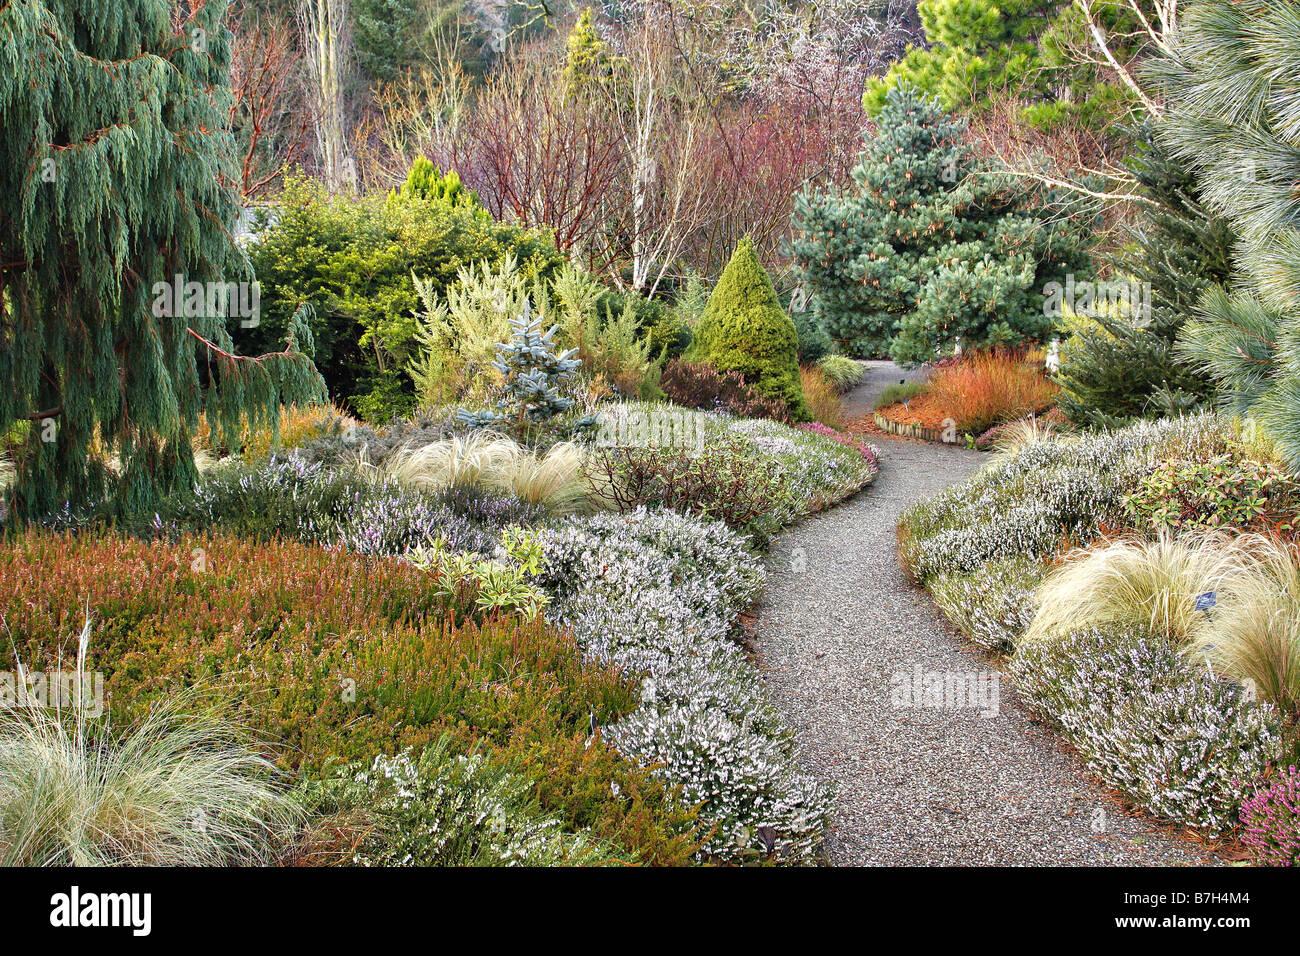 winding garden path stock photos u0026 winding garden path stock